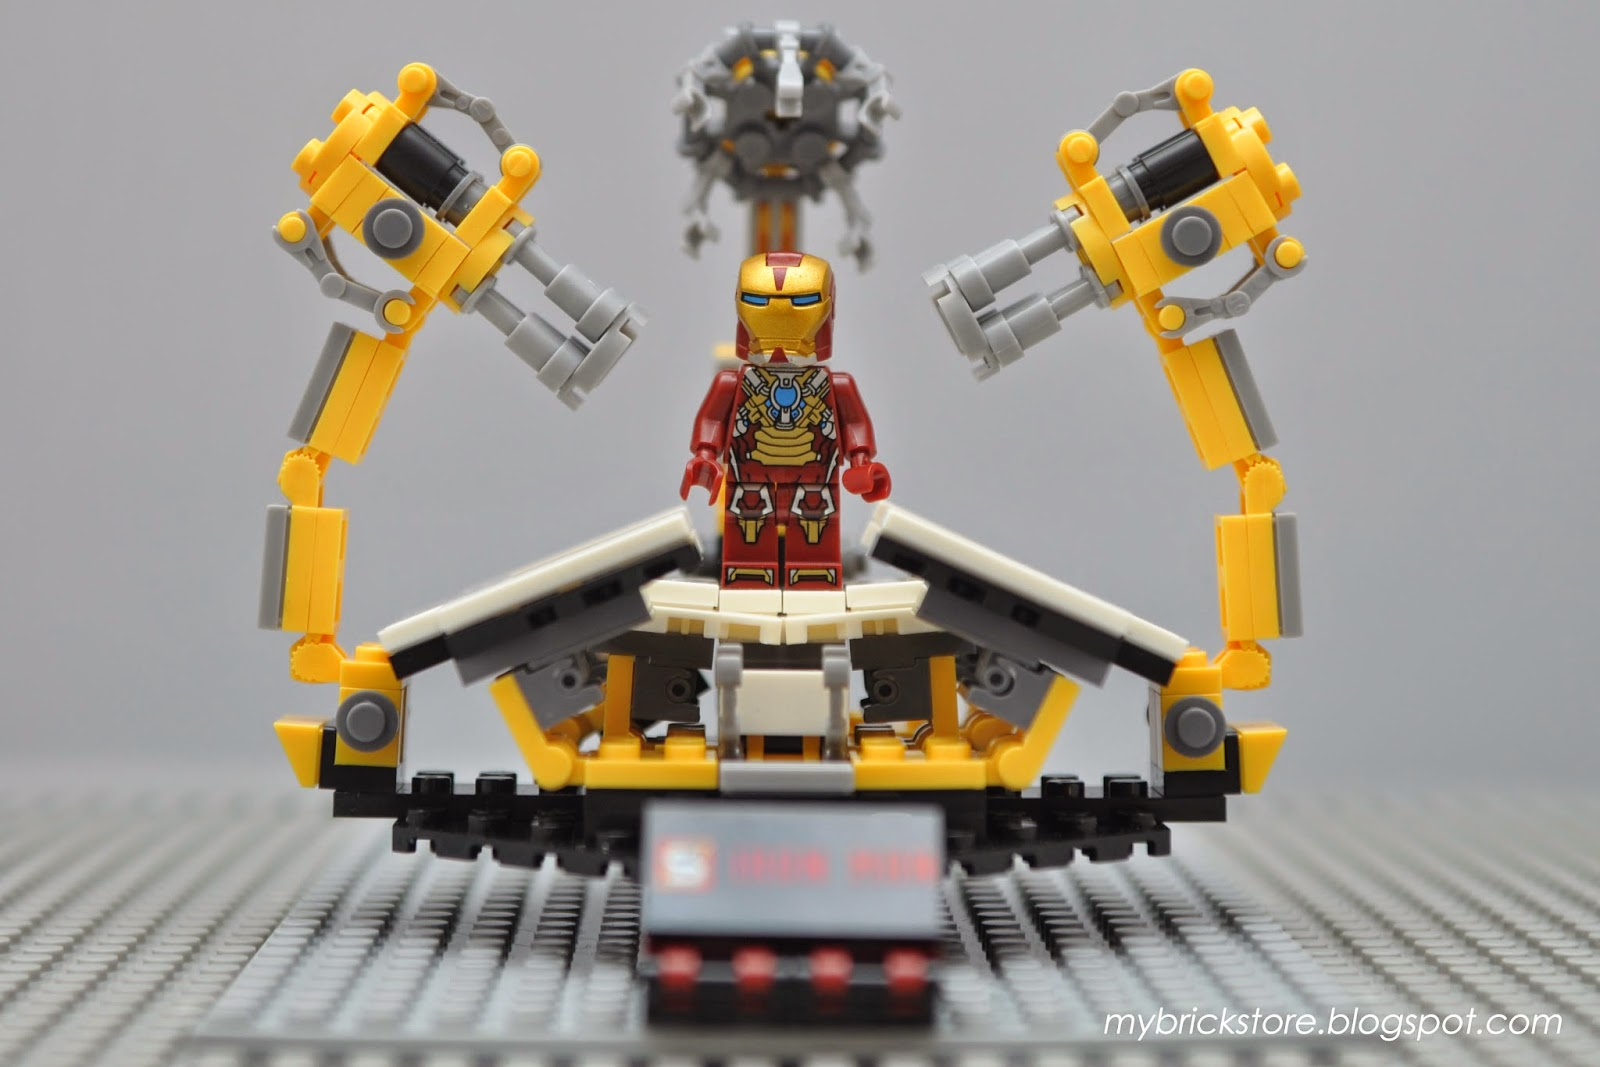 My Brick Store: Lego Iron Man Gantry - SY304 by Sheng Yuan